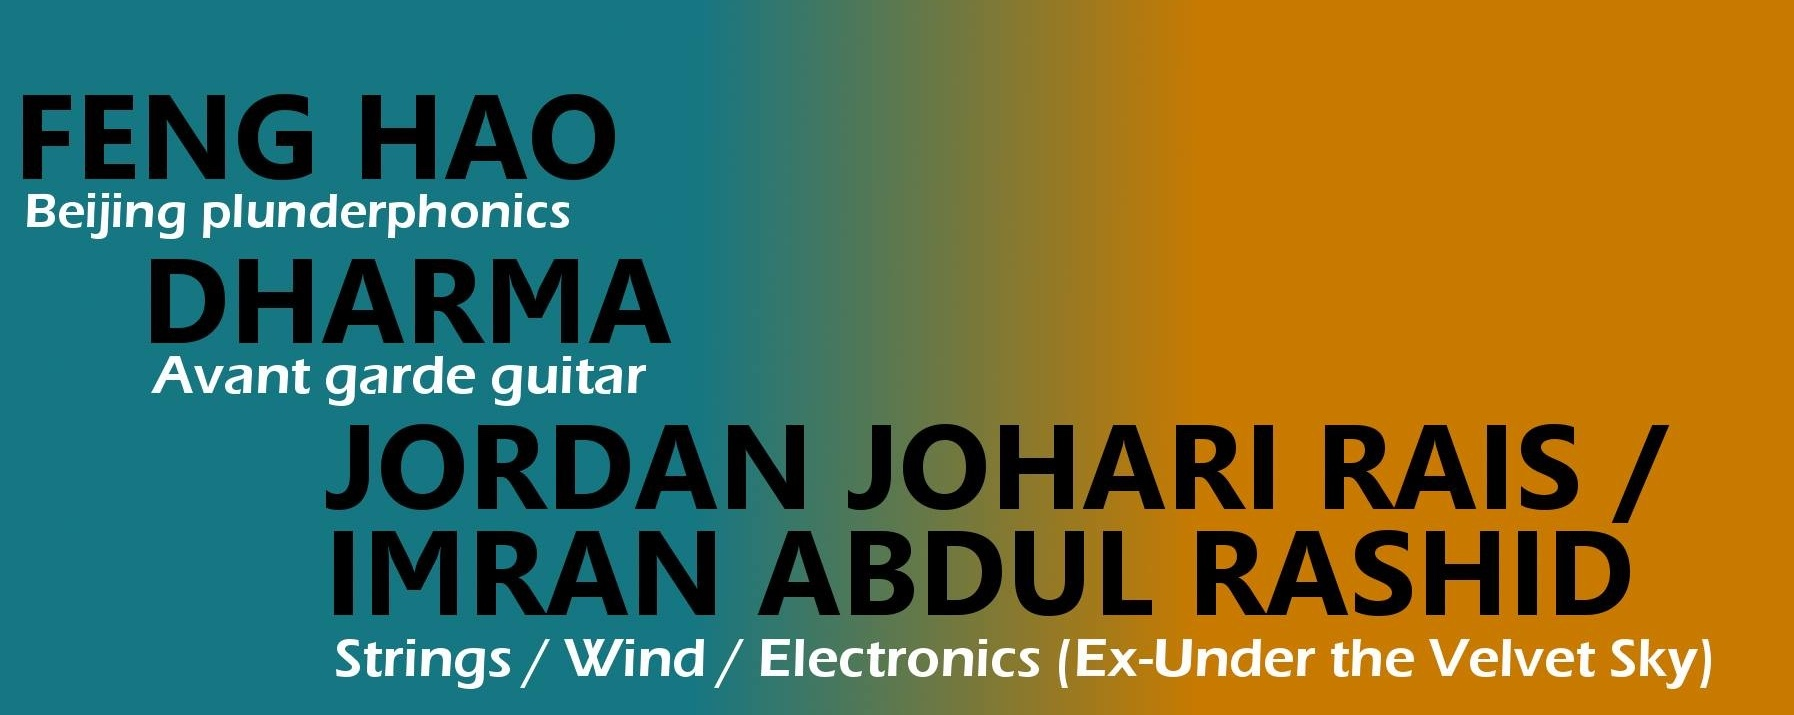 Ujikaji presents Feng Hao / Dharma / Jordan Johari Rais & Imran Abdul Rashid